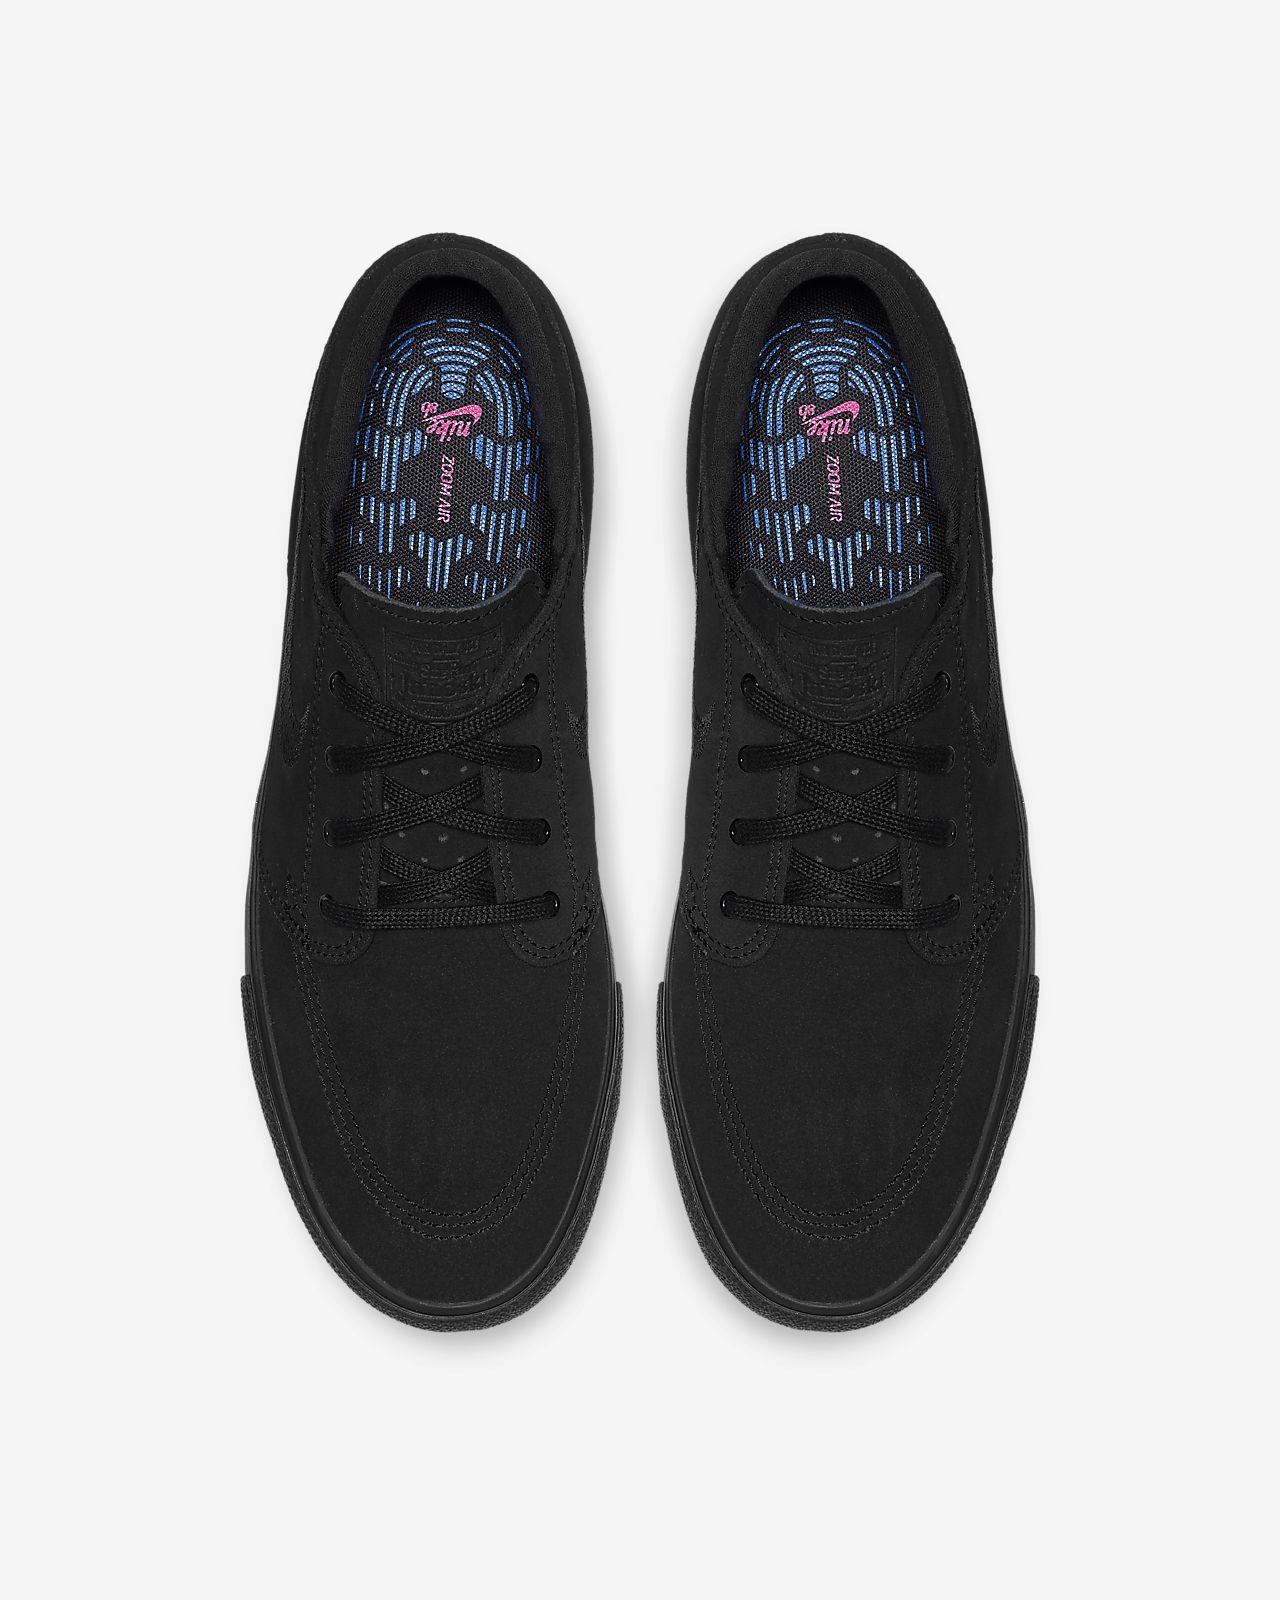 Nike SB Janoski RM Black Suede Skate Shoes